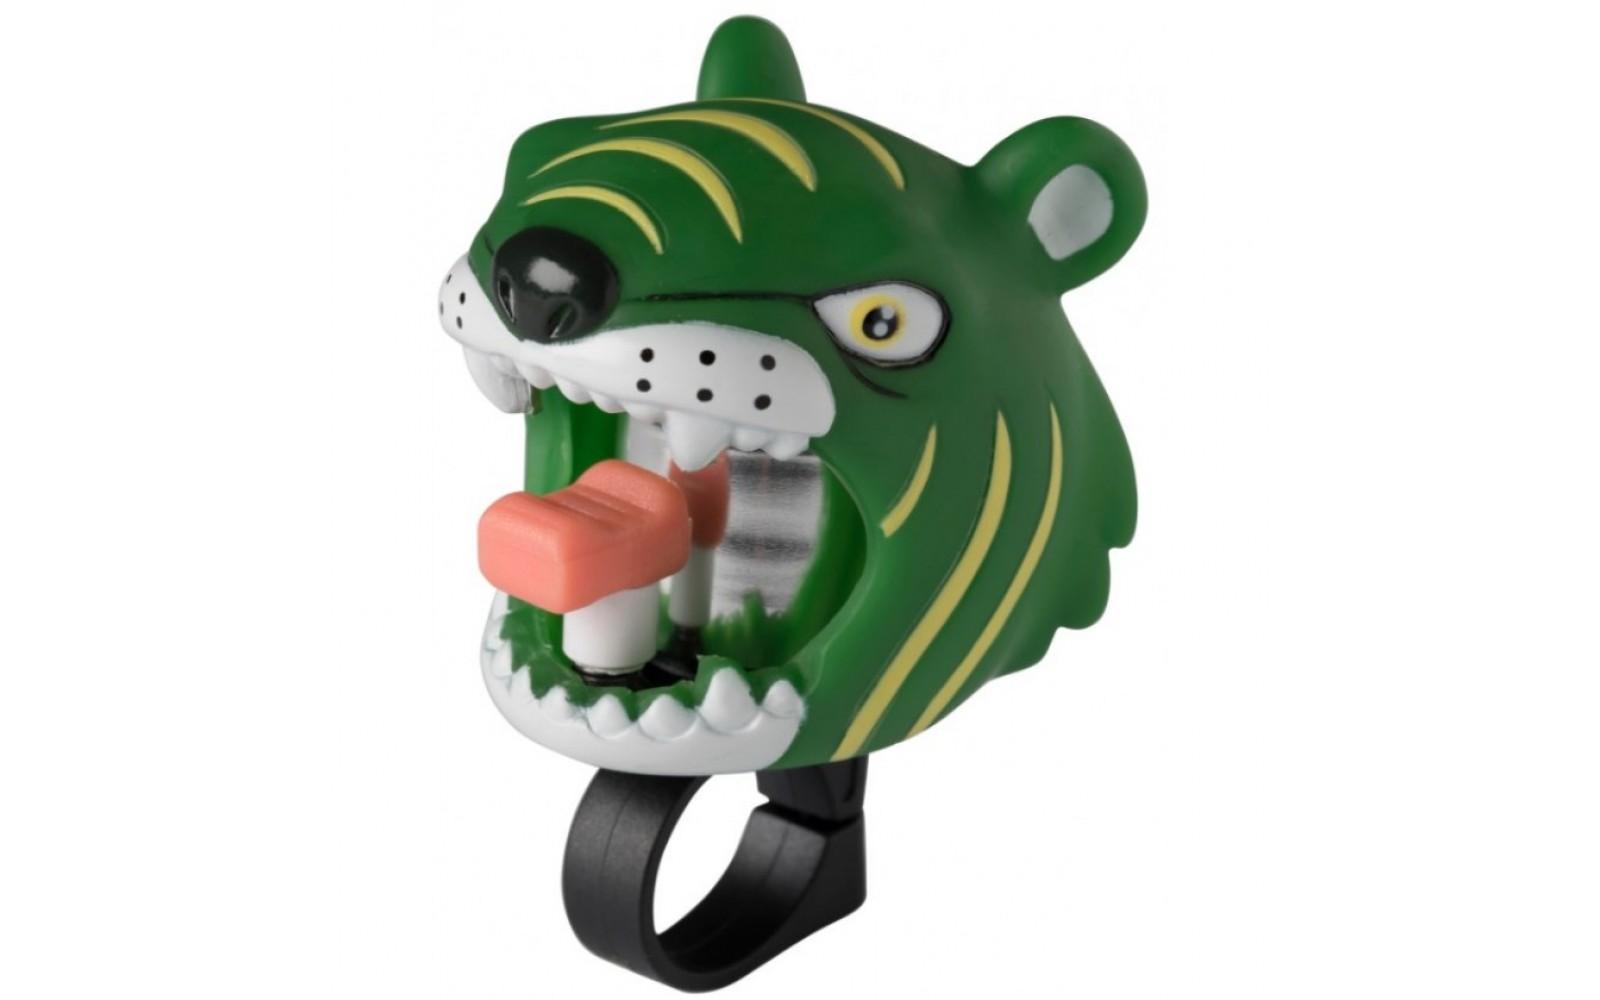 Звонок Green Tiger (зелёный тигр) Crazy Safety